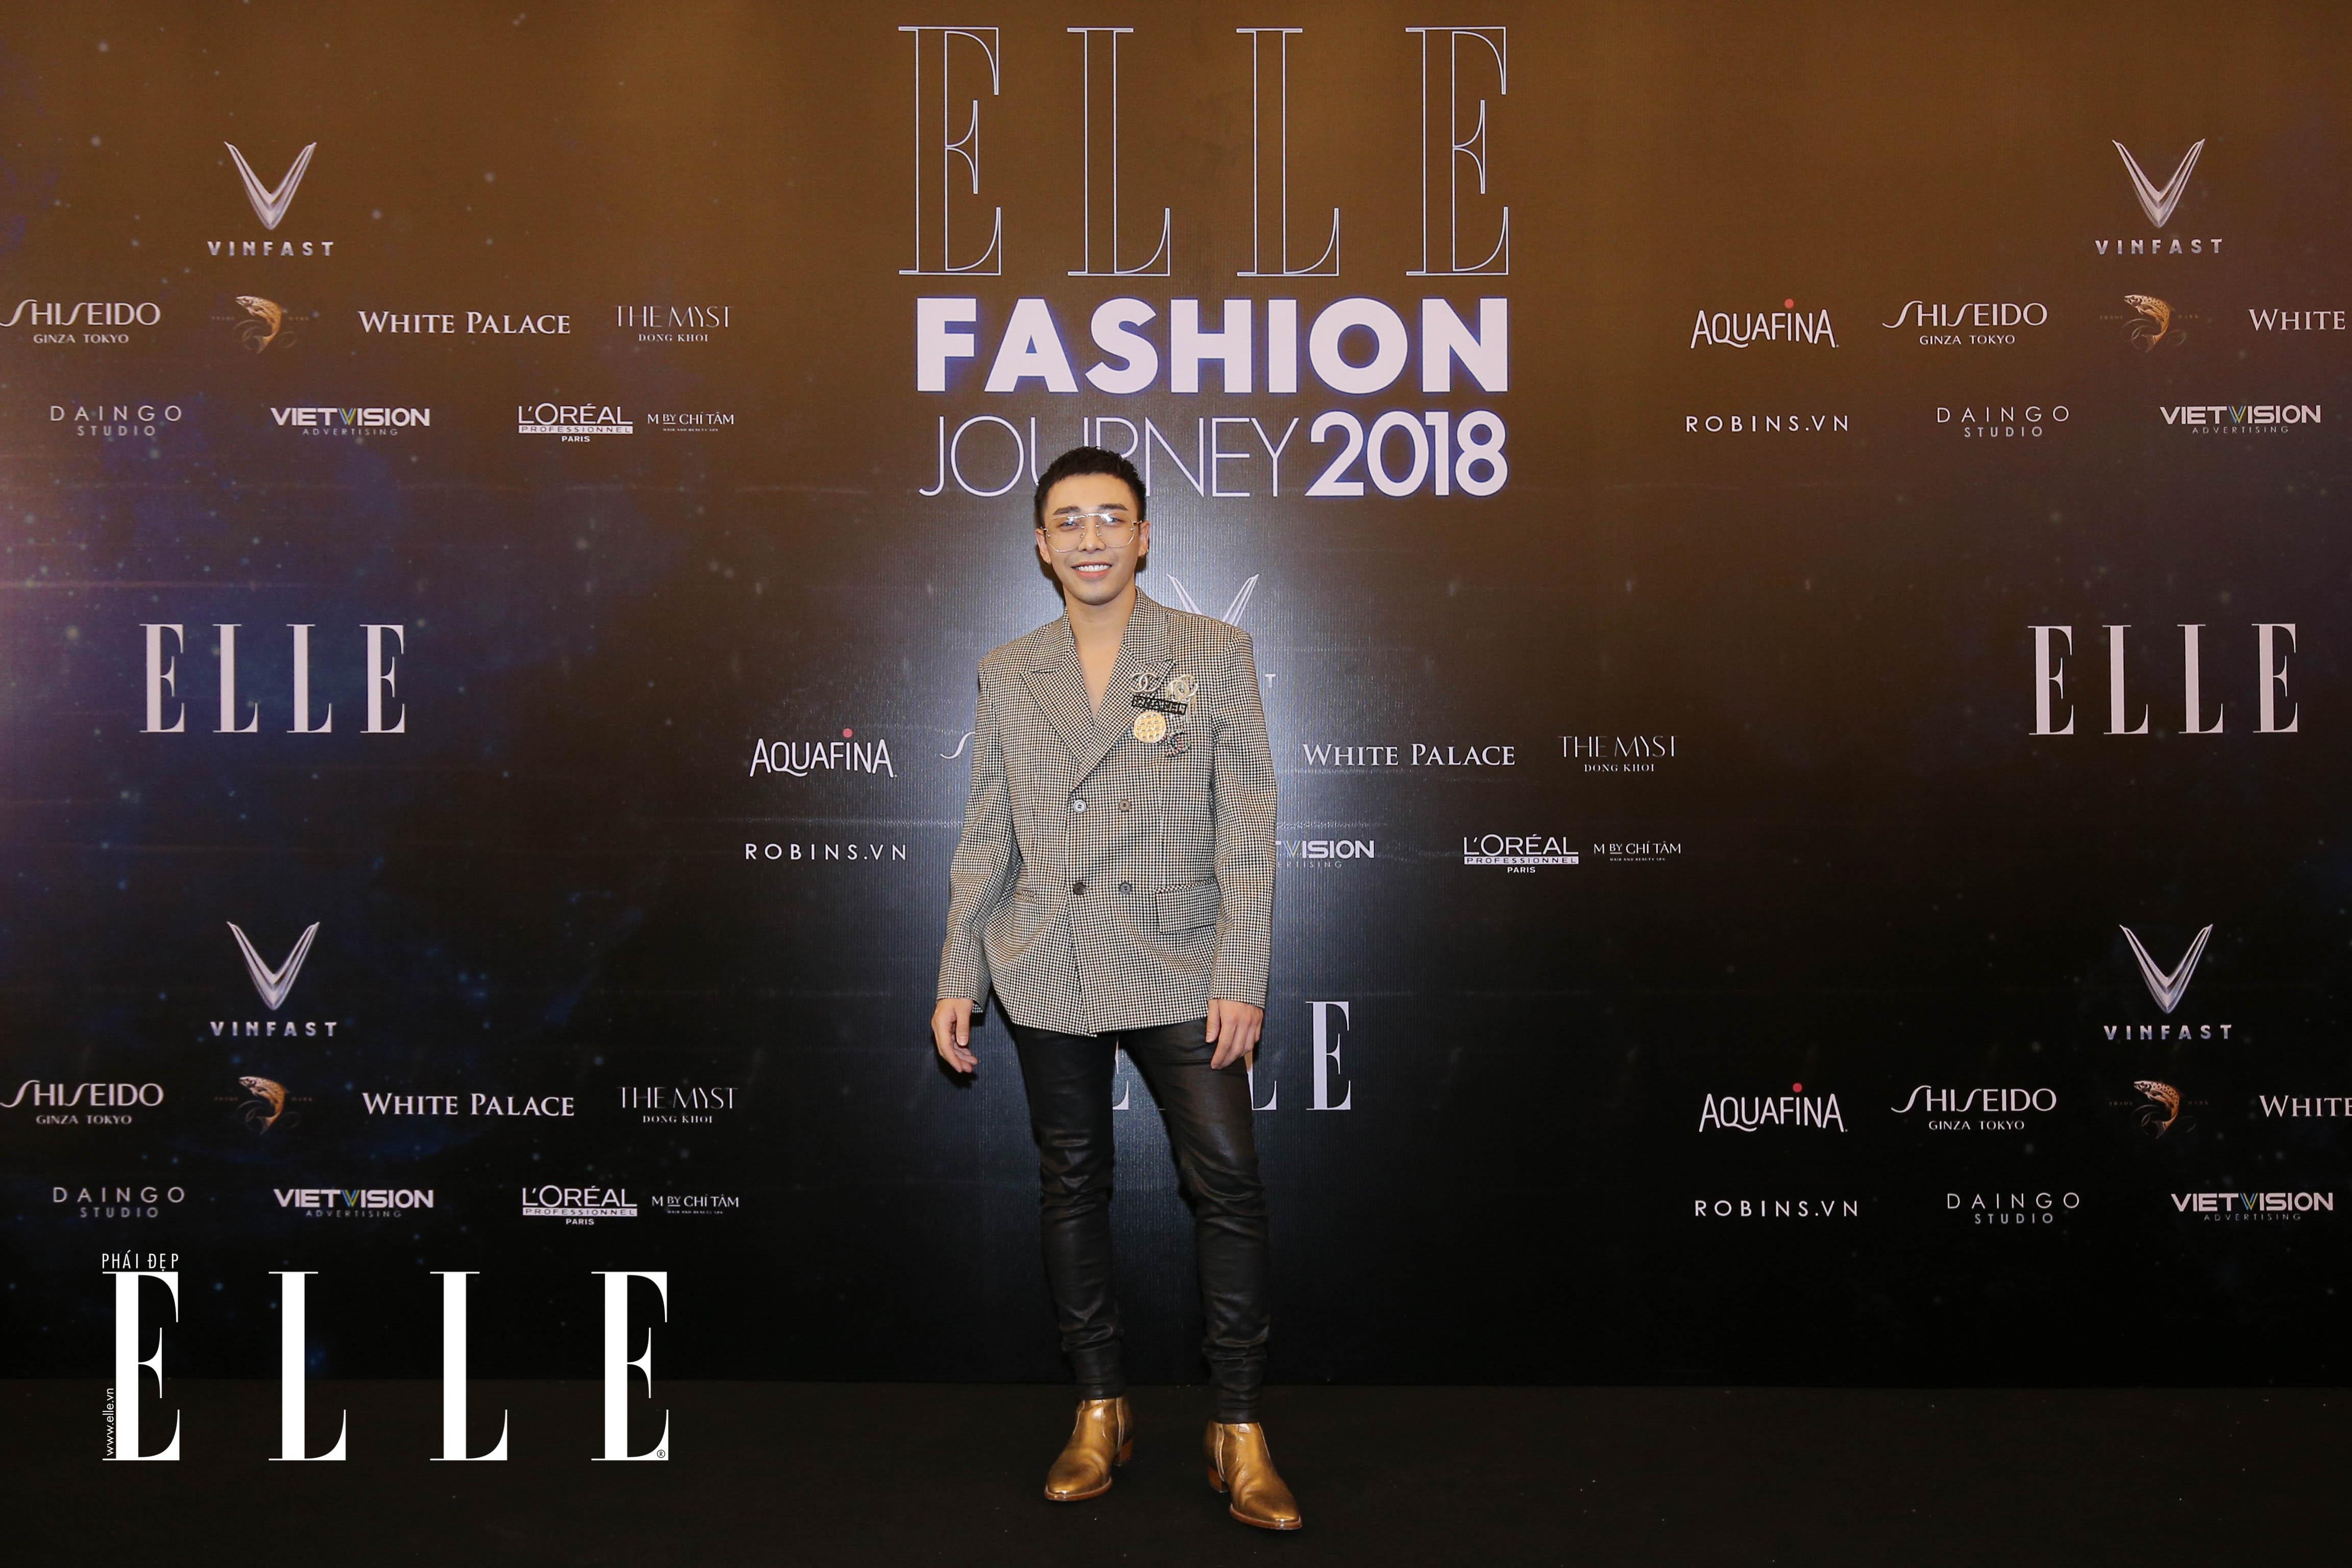 ELLE Fashion Journey tham do 24